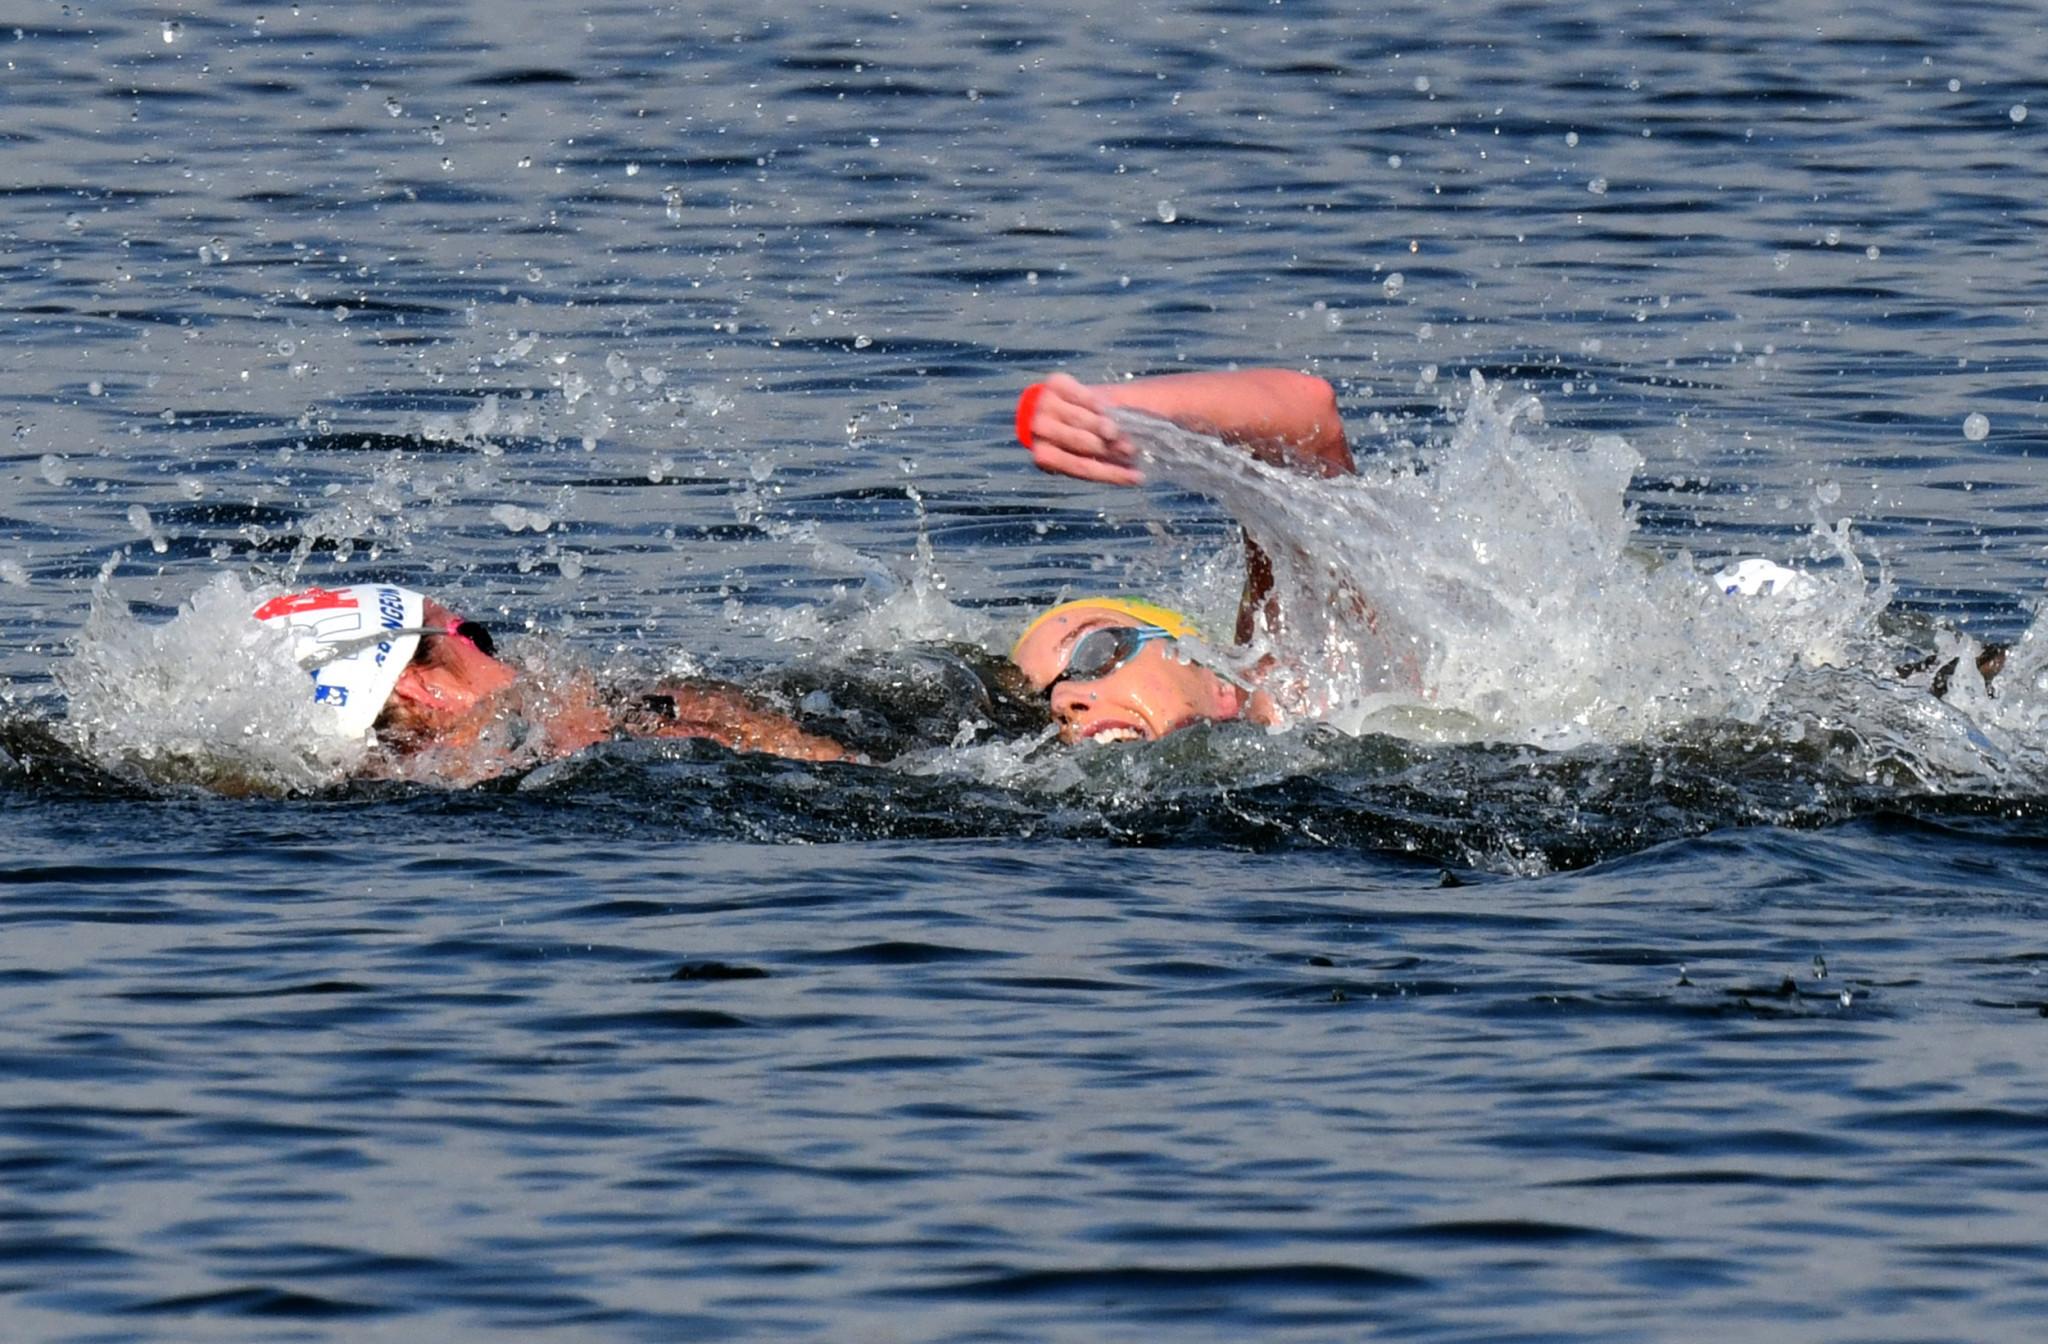 Tokyo 2020 and FINA eye alternations to marathon swimming course